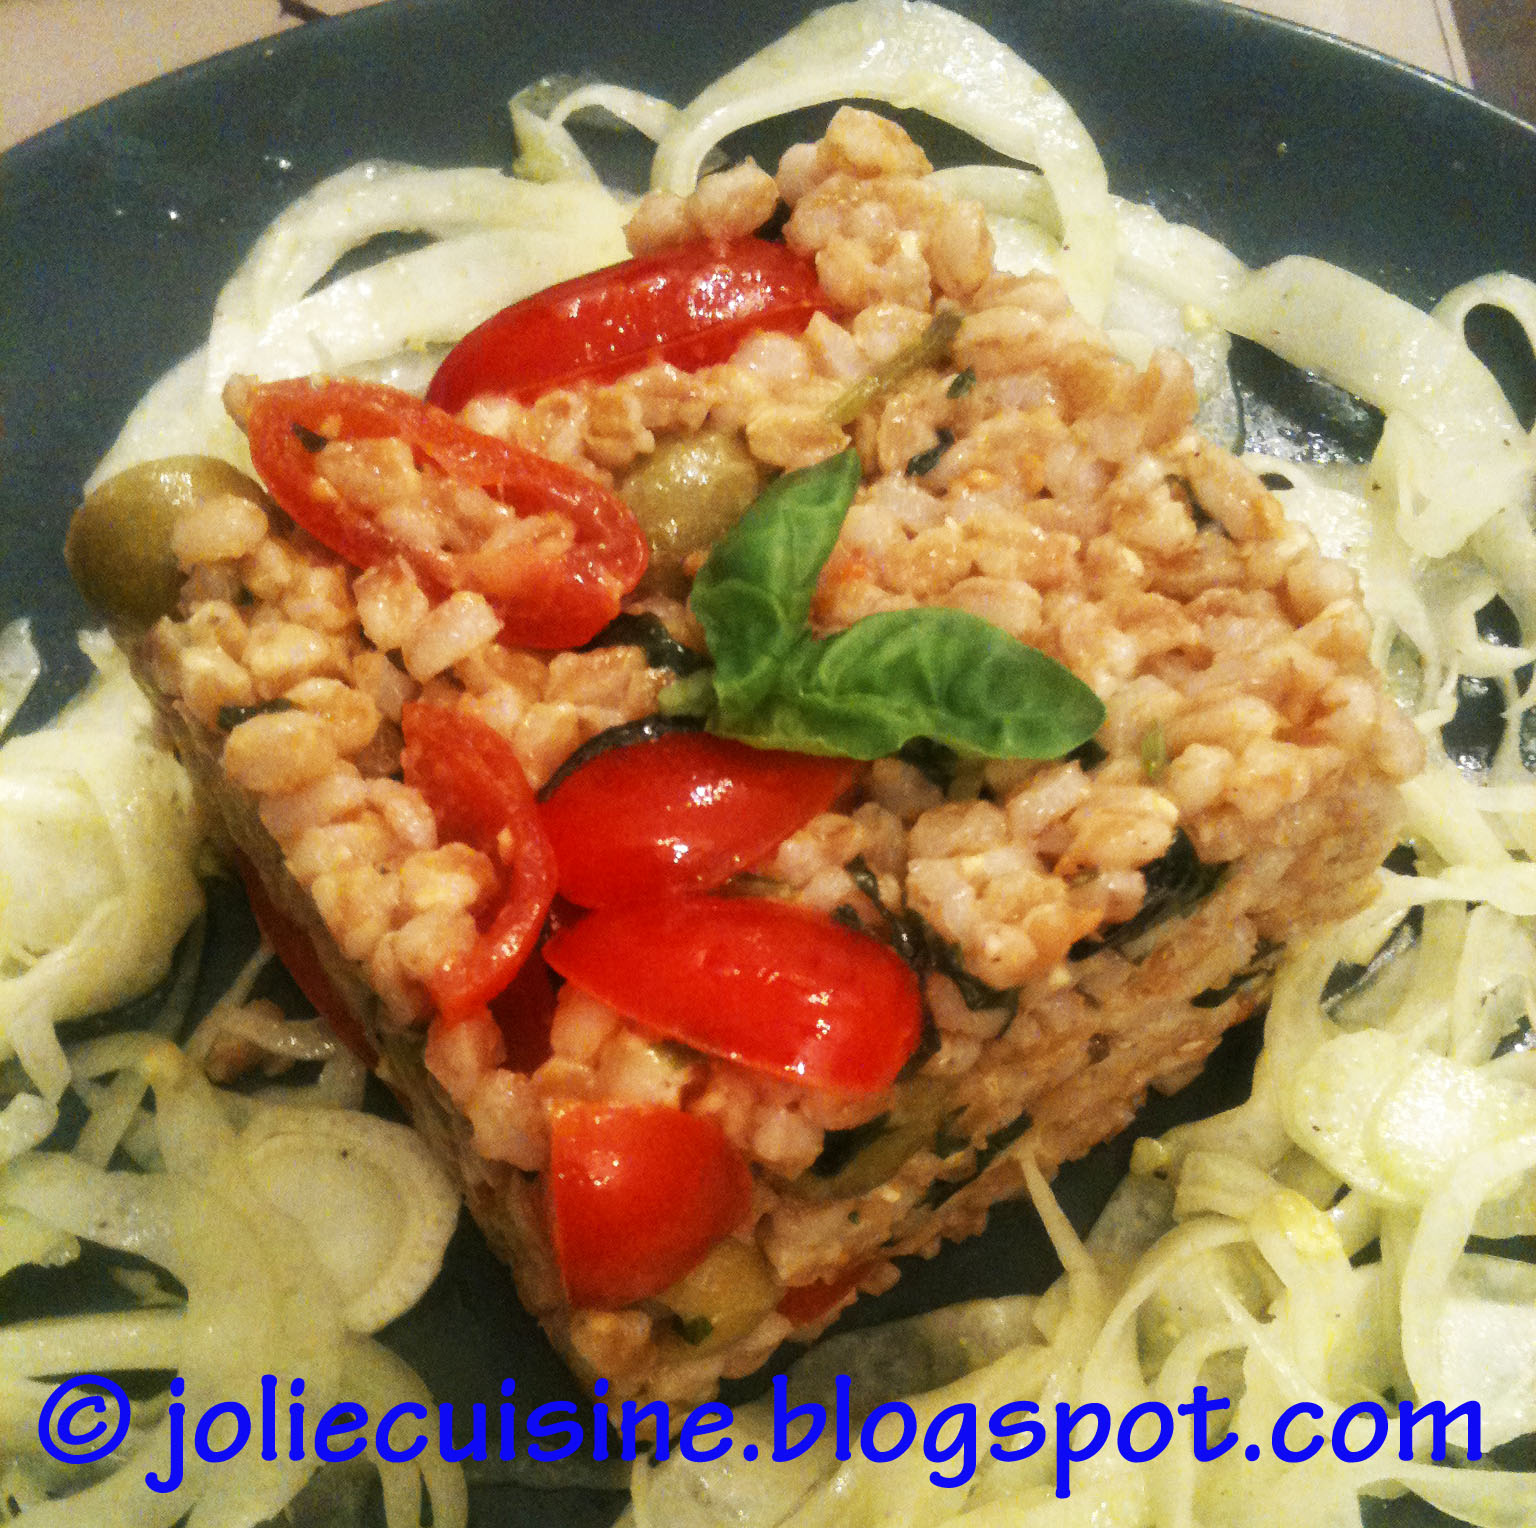 Jolie cuisine insalata di farro e tartare di finocchi for Jolie cuisine